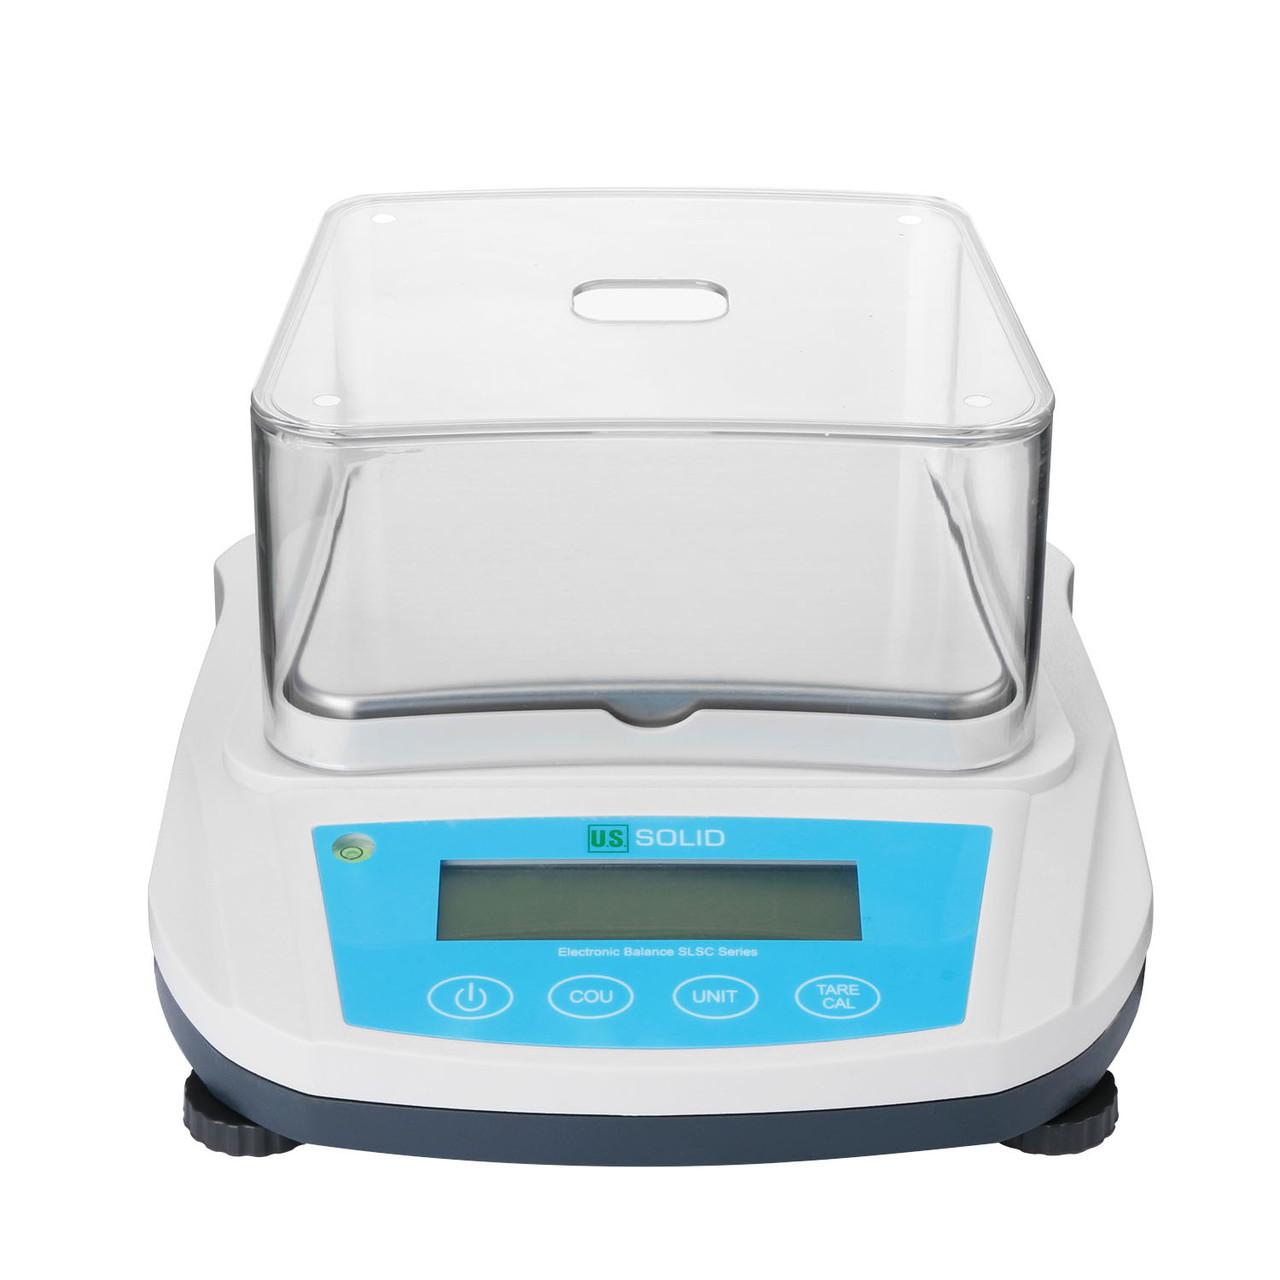 U.S. Solid Precision Balance Digital Lab Scale 200gx 0.01g, RS232 Interface